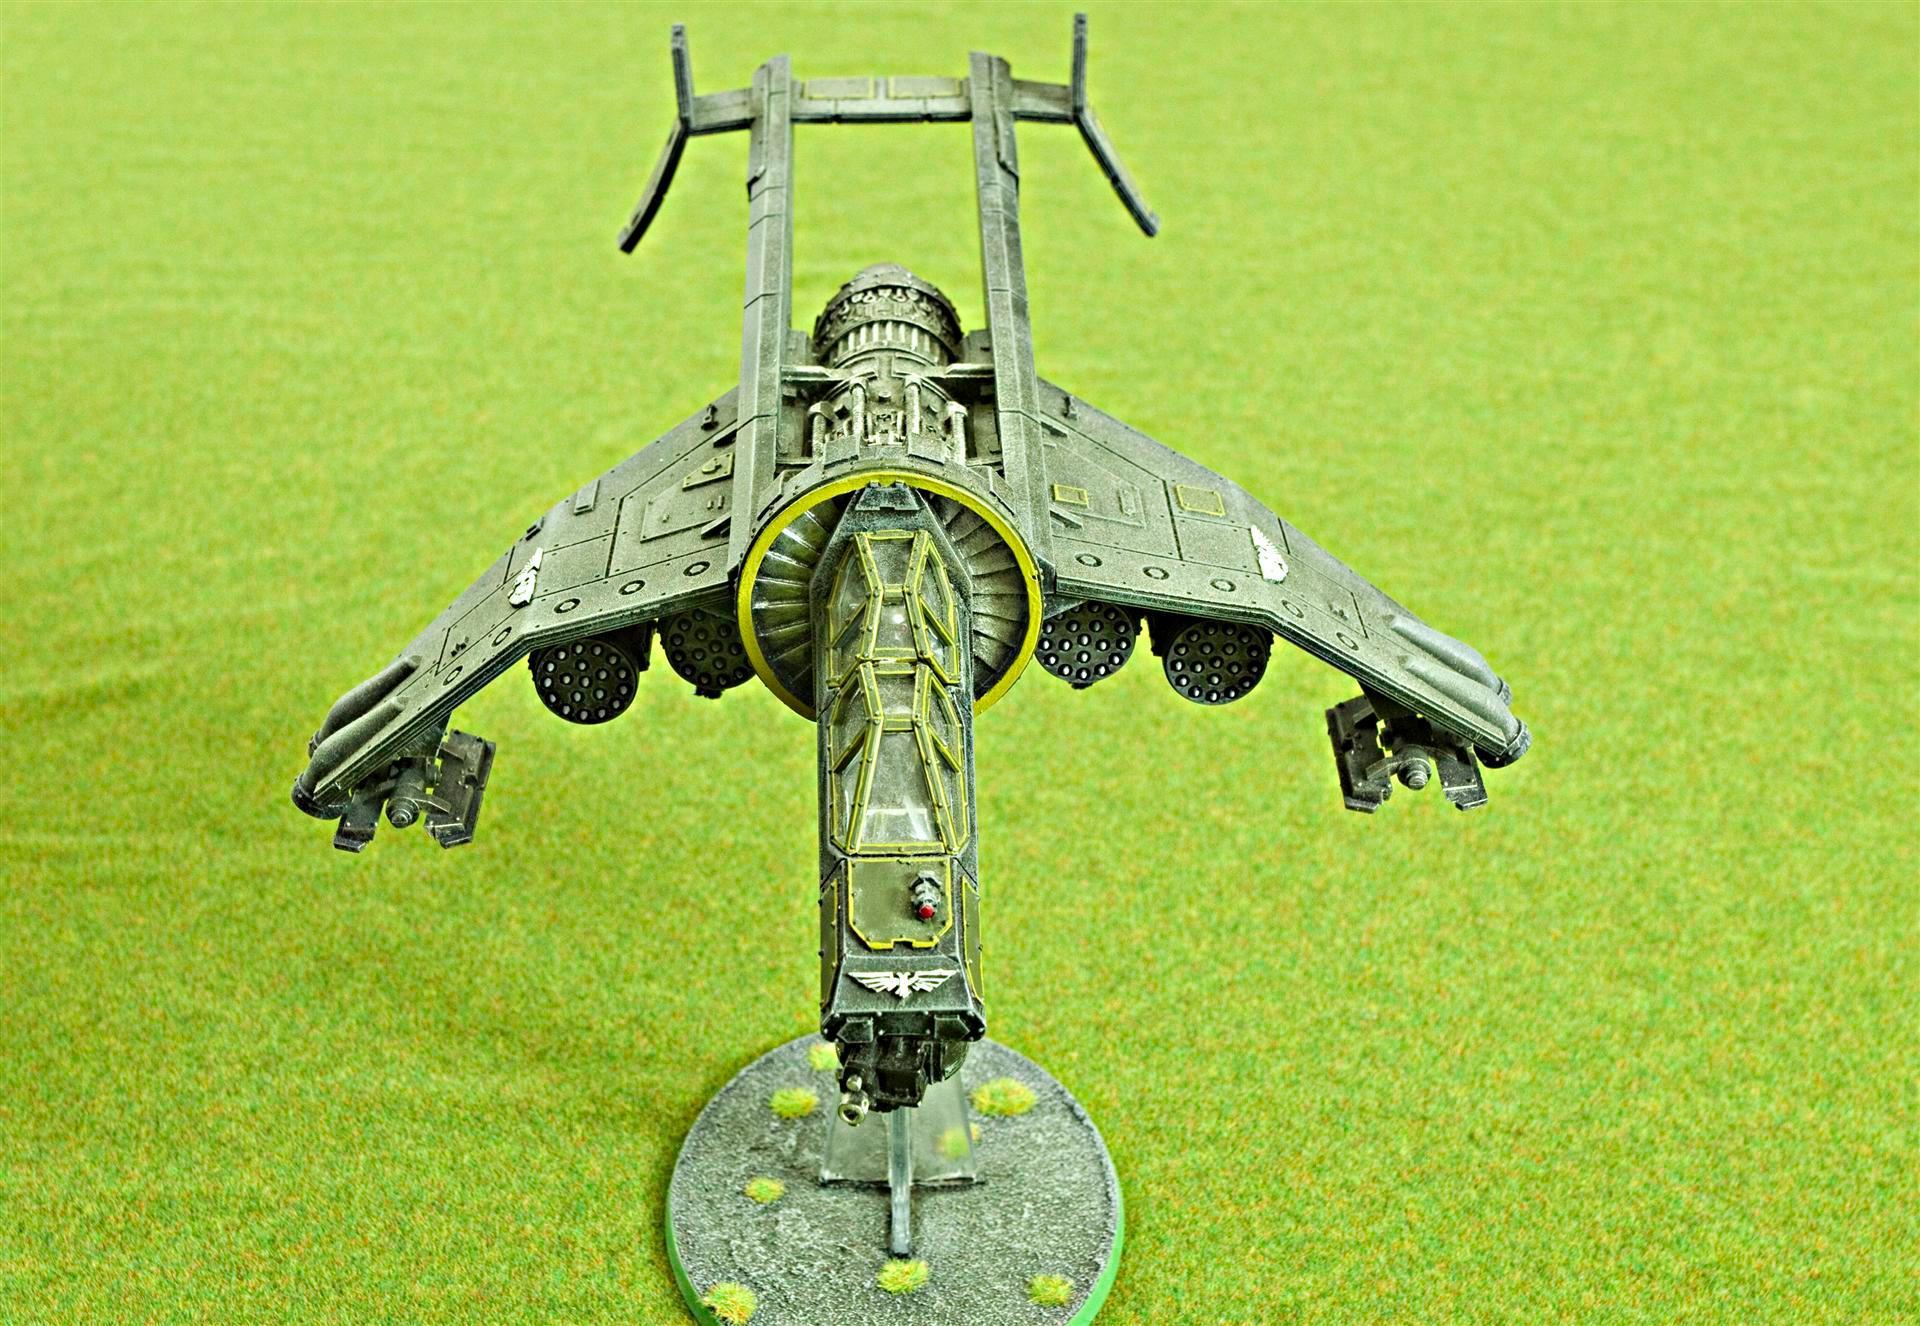 Astra Militarum, Guard, Imperial, Imperial Guard, Vulture, Warhammer 40,000